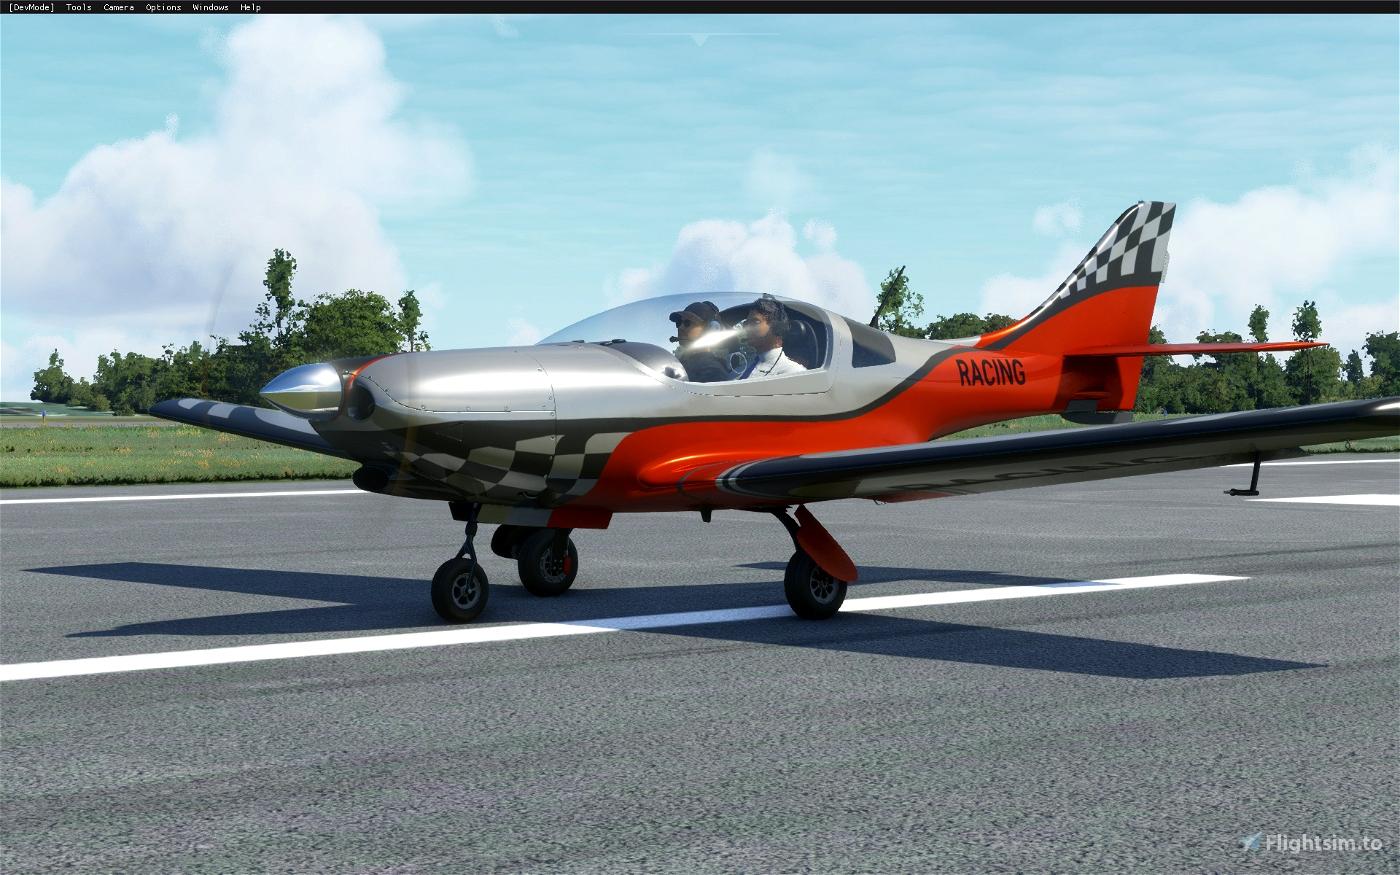 JMB VL-3 Racing Livery (5 colors) Flight Simulator 2020